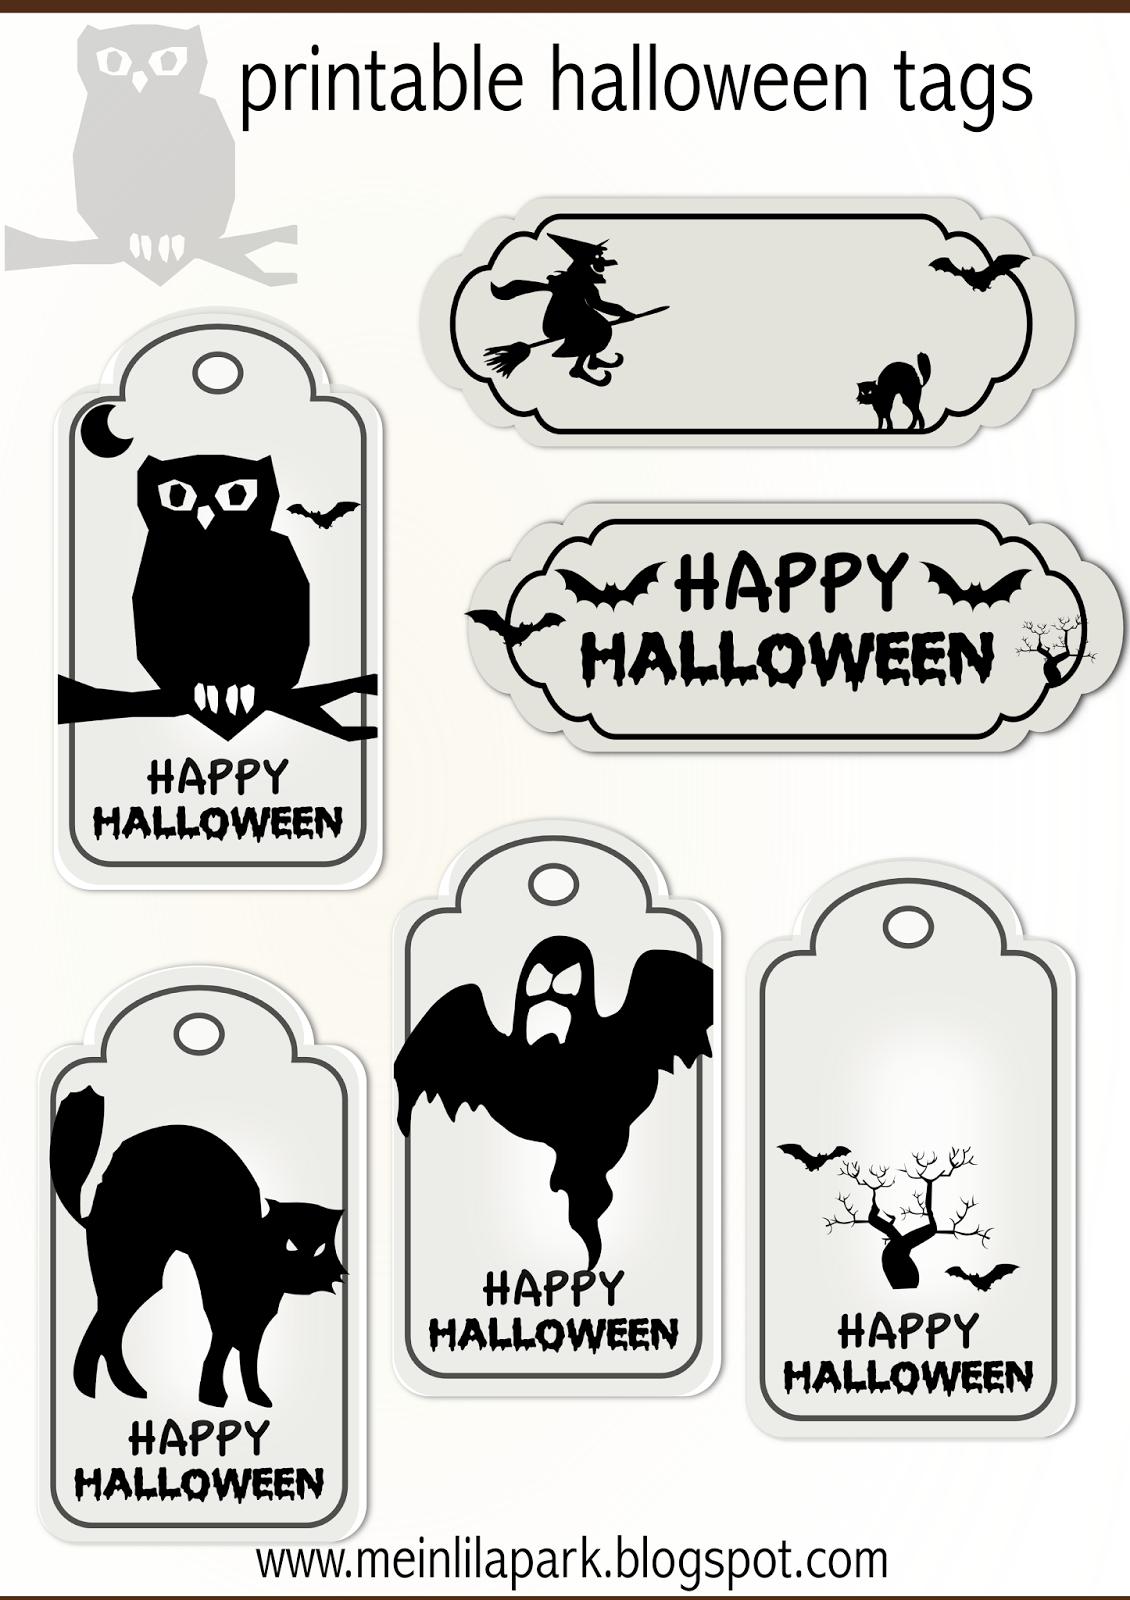 Free Printable Halloween Tags - Druckvorlage Halloween - Freebie - Free Printable Halloween Homework Pass